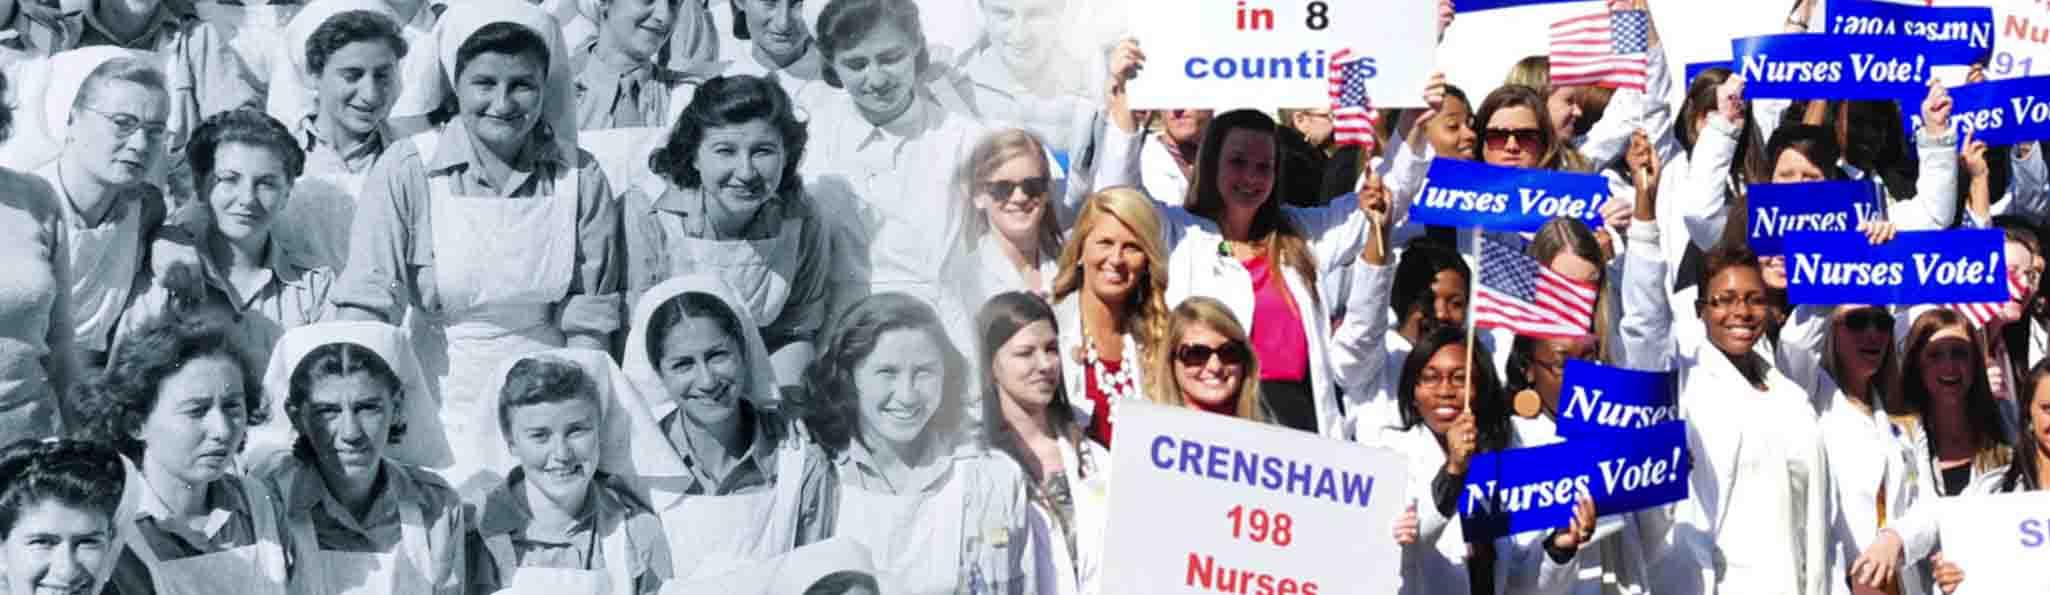 Historic nurses blending into current-day photo of nurses